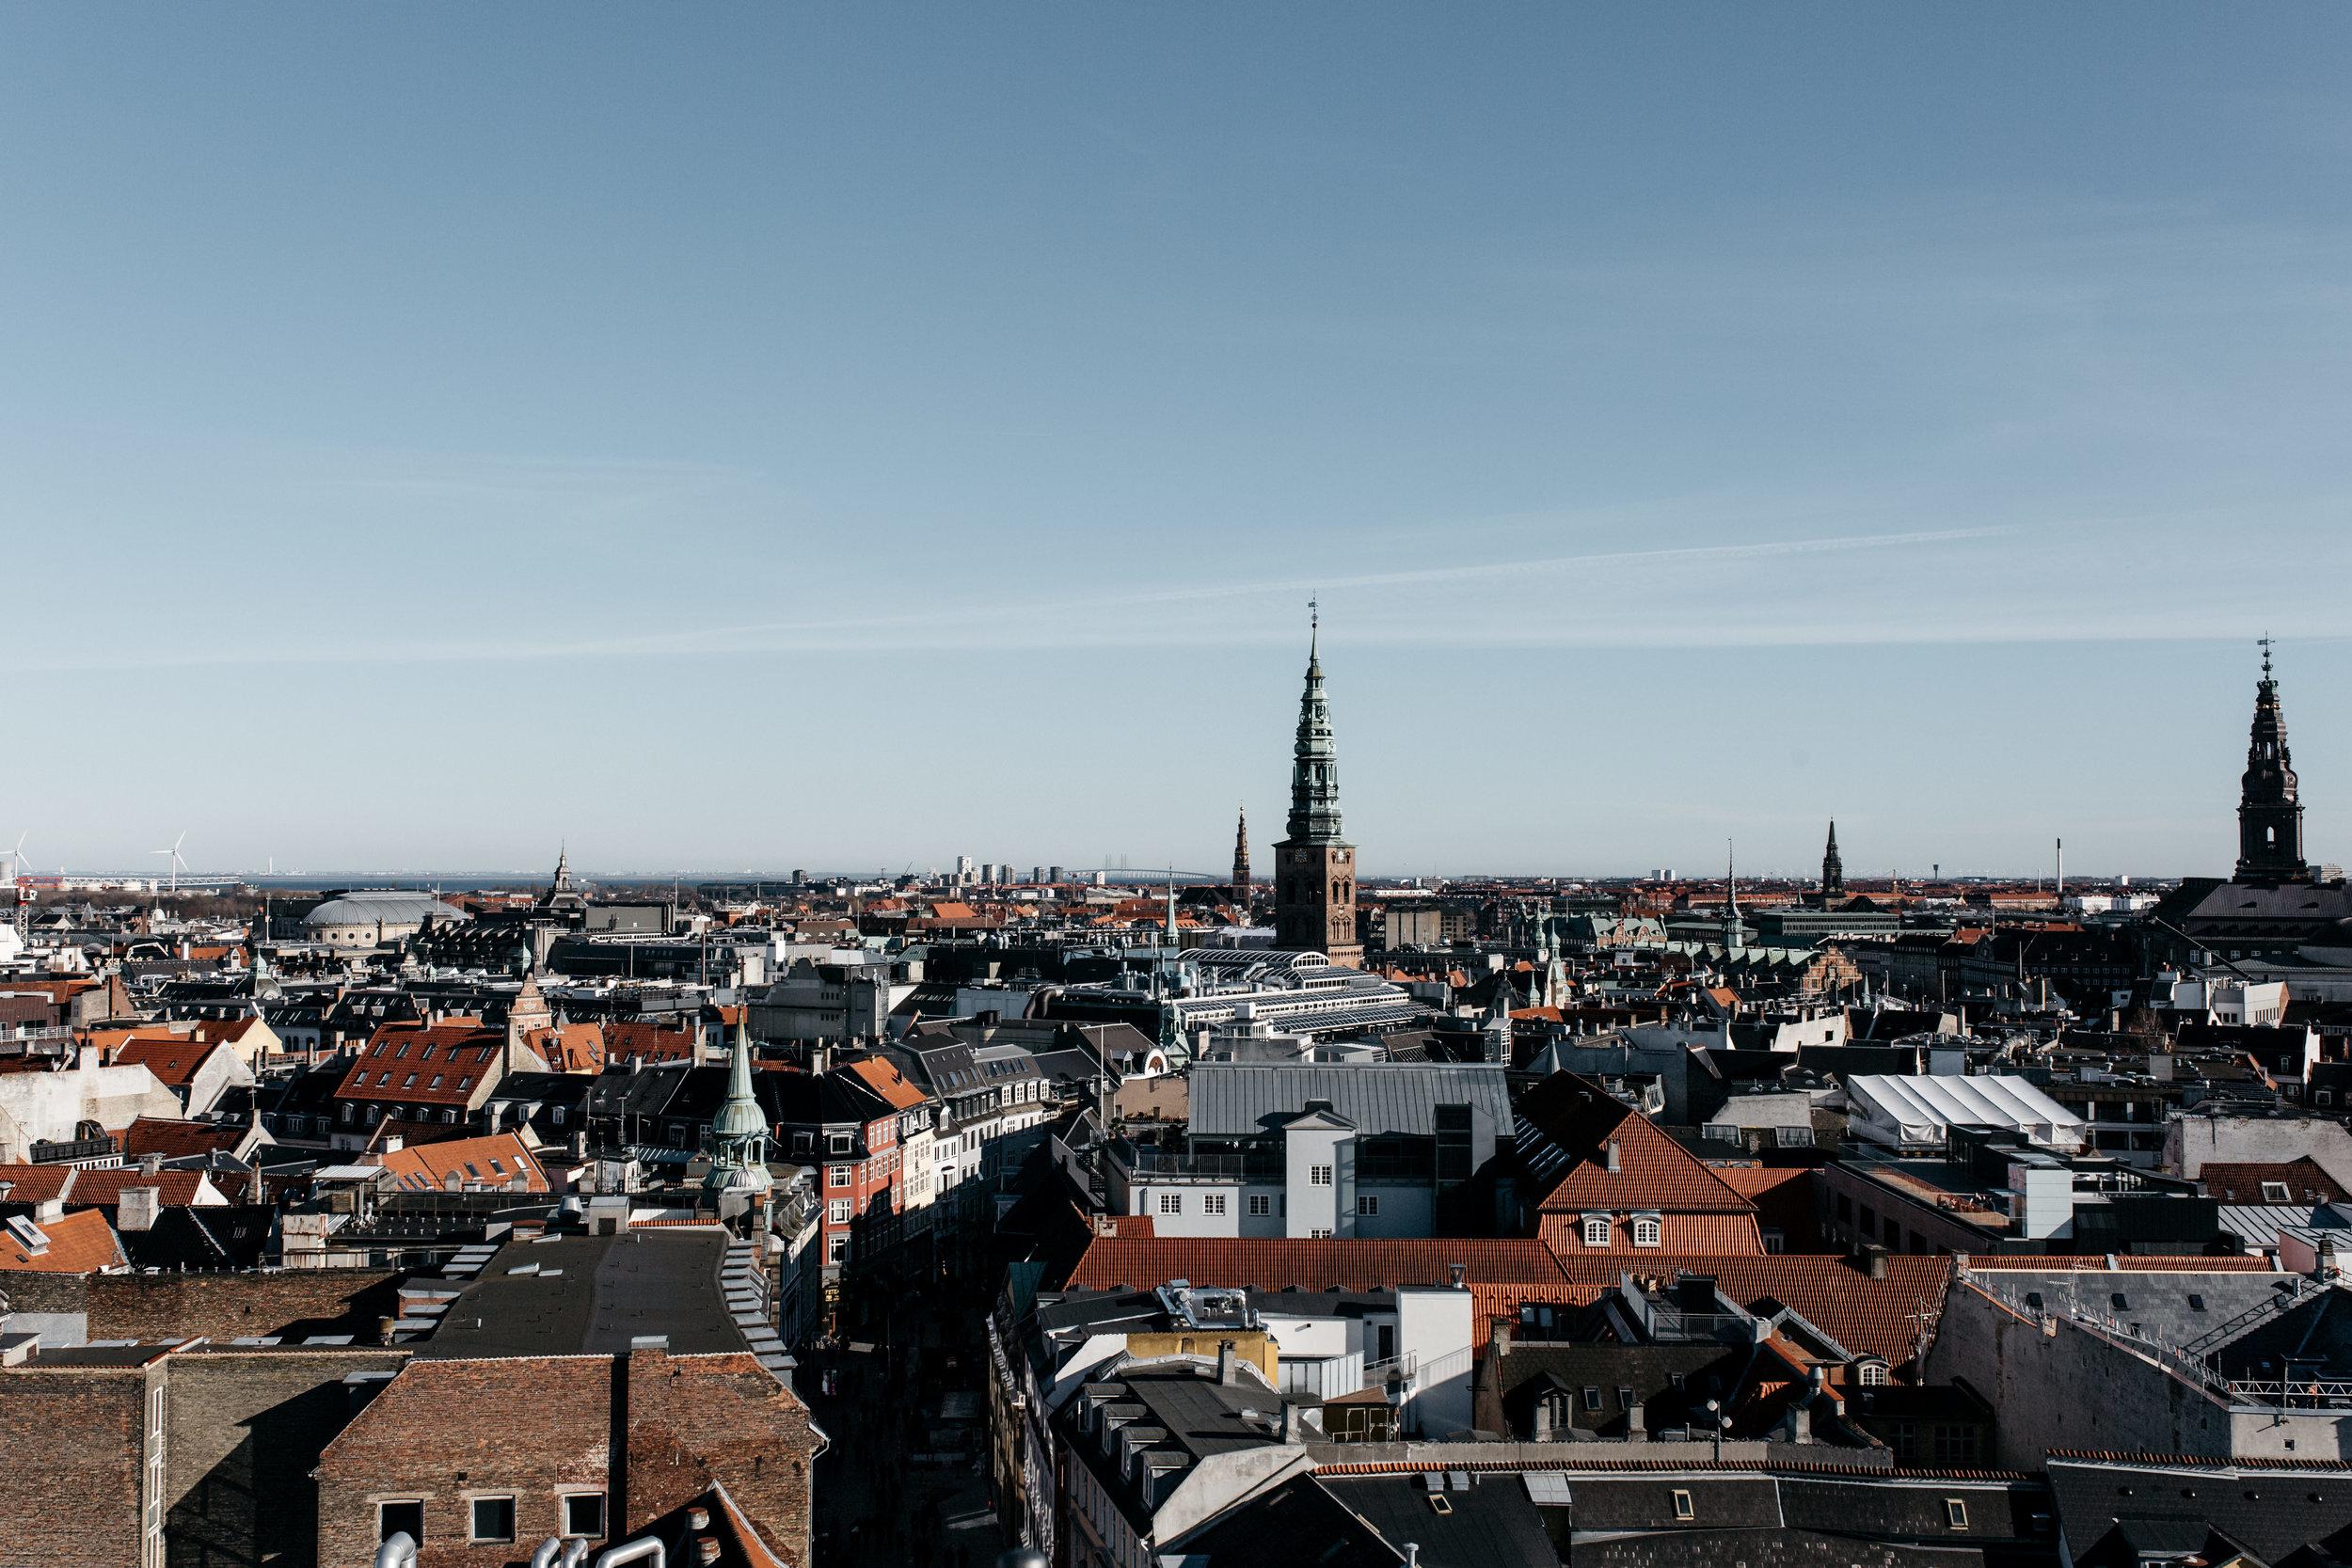 View during high noon from Copenhagen's Rundetårn.